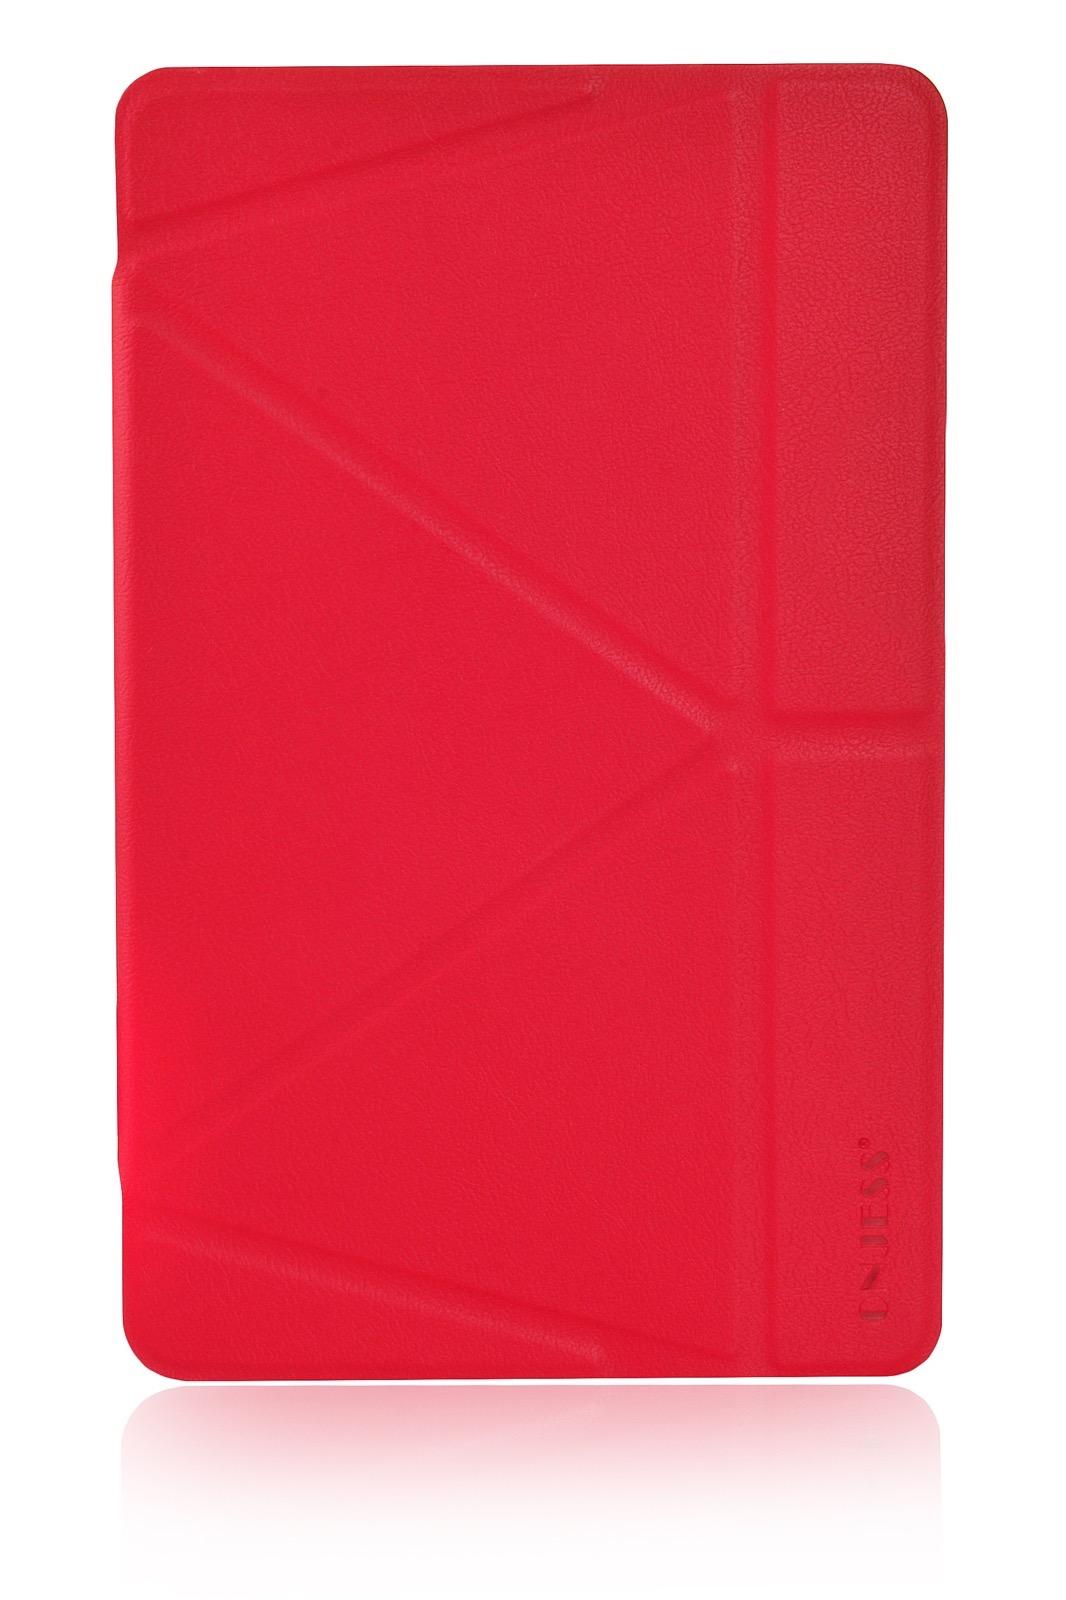 Чехол для планшета Onjess Smart для Samsung Tab S4 10.5 T835, 908030, красный аксессуар чехол onjess для samsung tab s4 10 5 t835 smart grey 908031